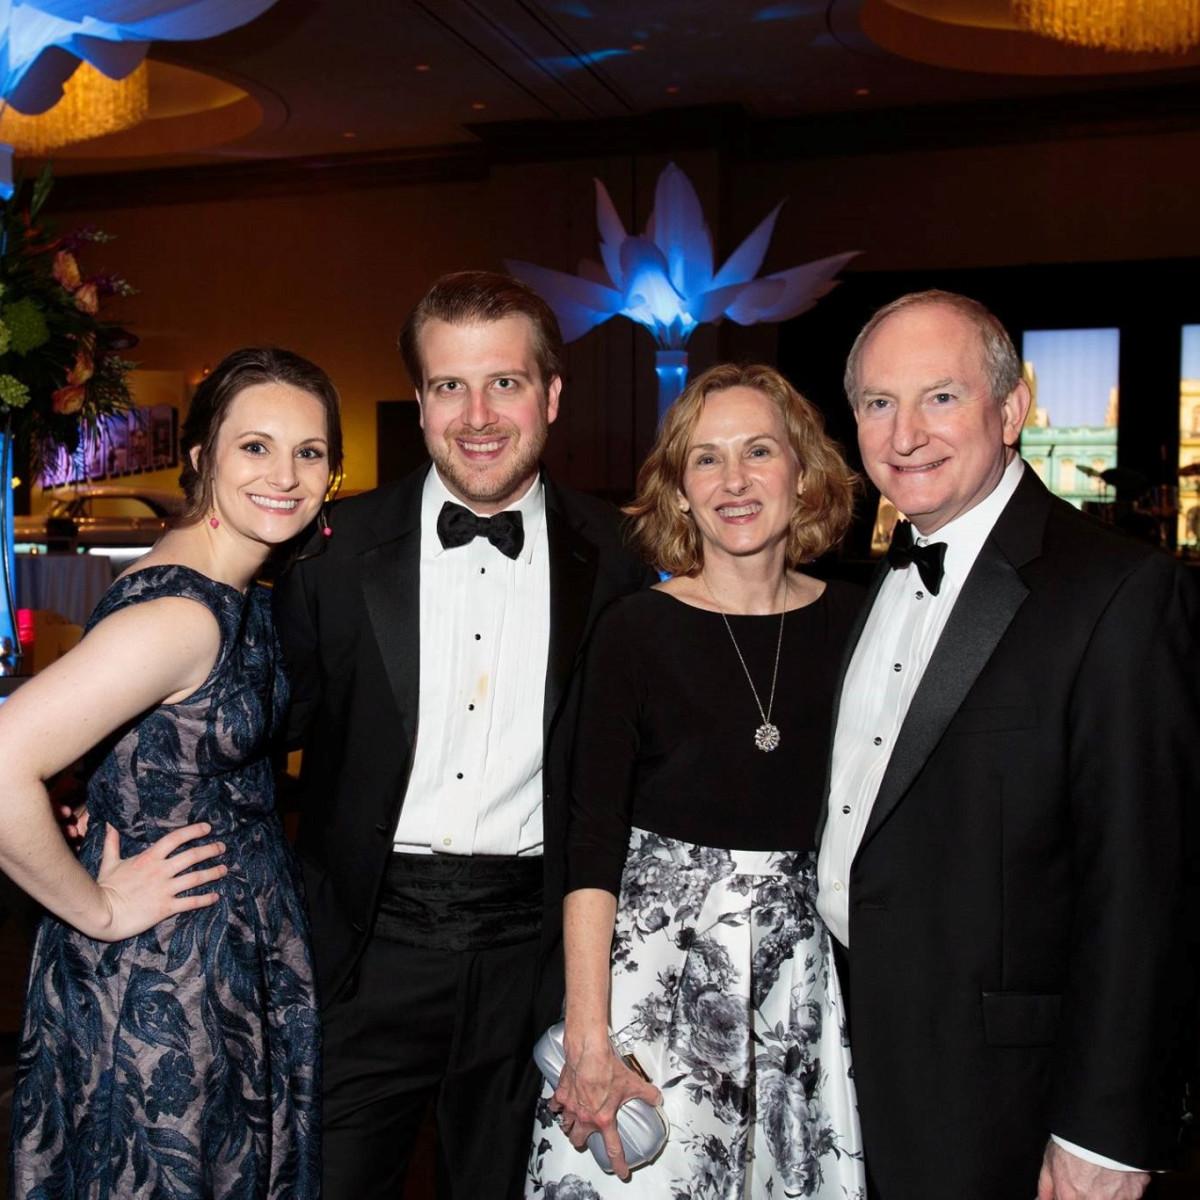 Amy Stone, Alex Jodry, Elizabeth Ann and Ken Stone, Slipper Club Havana Nights 2018